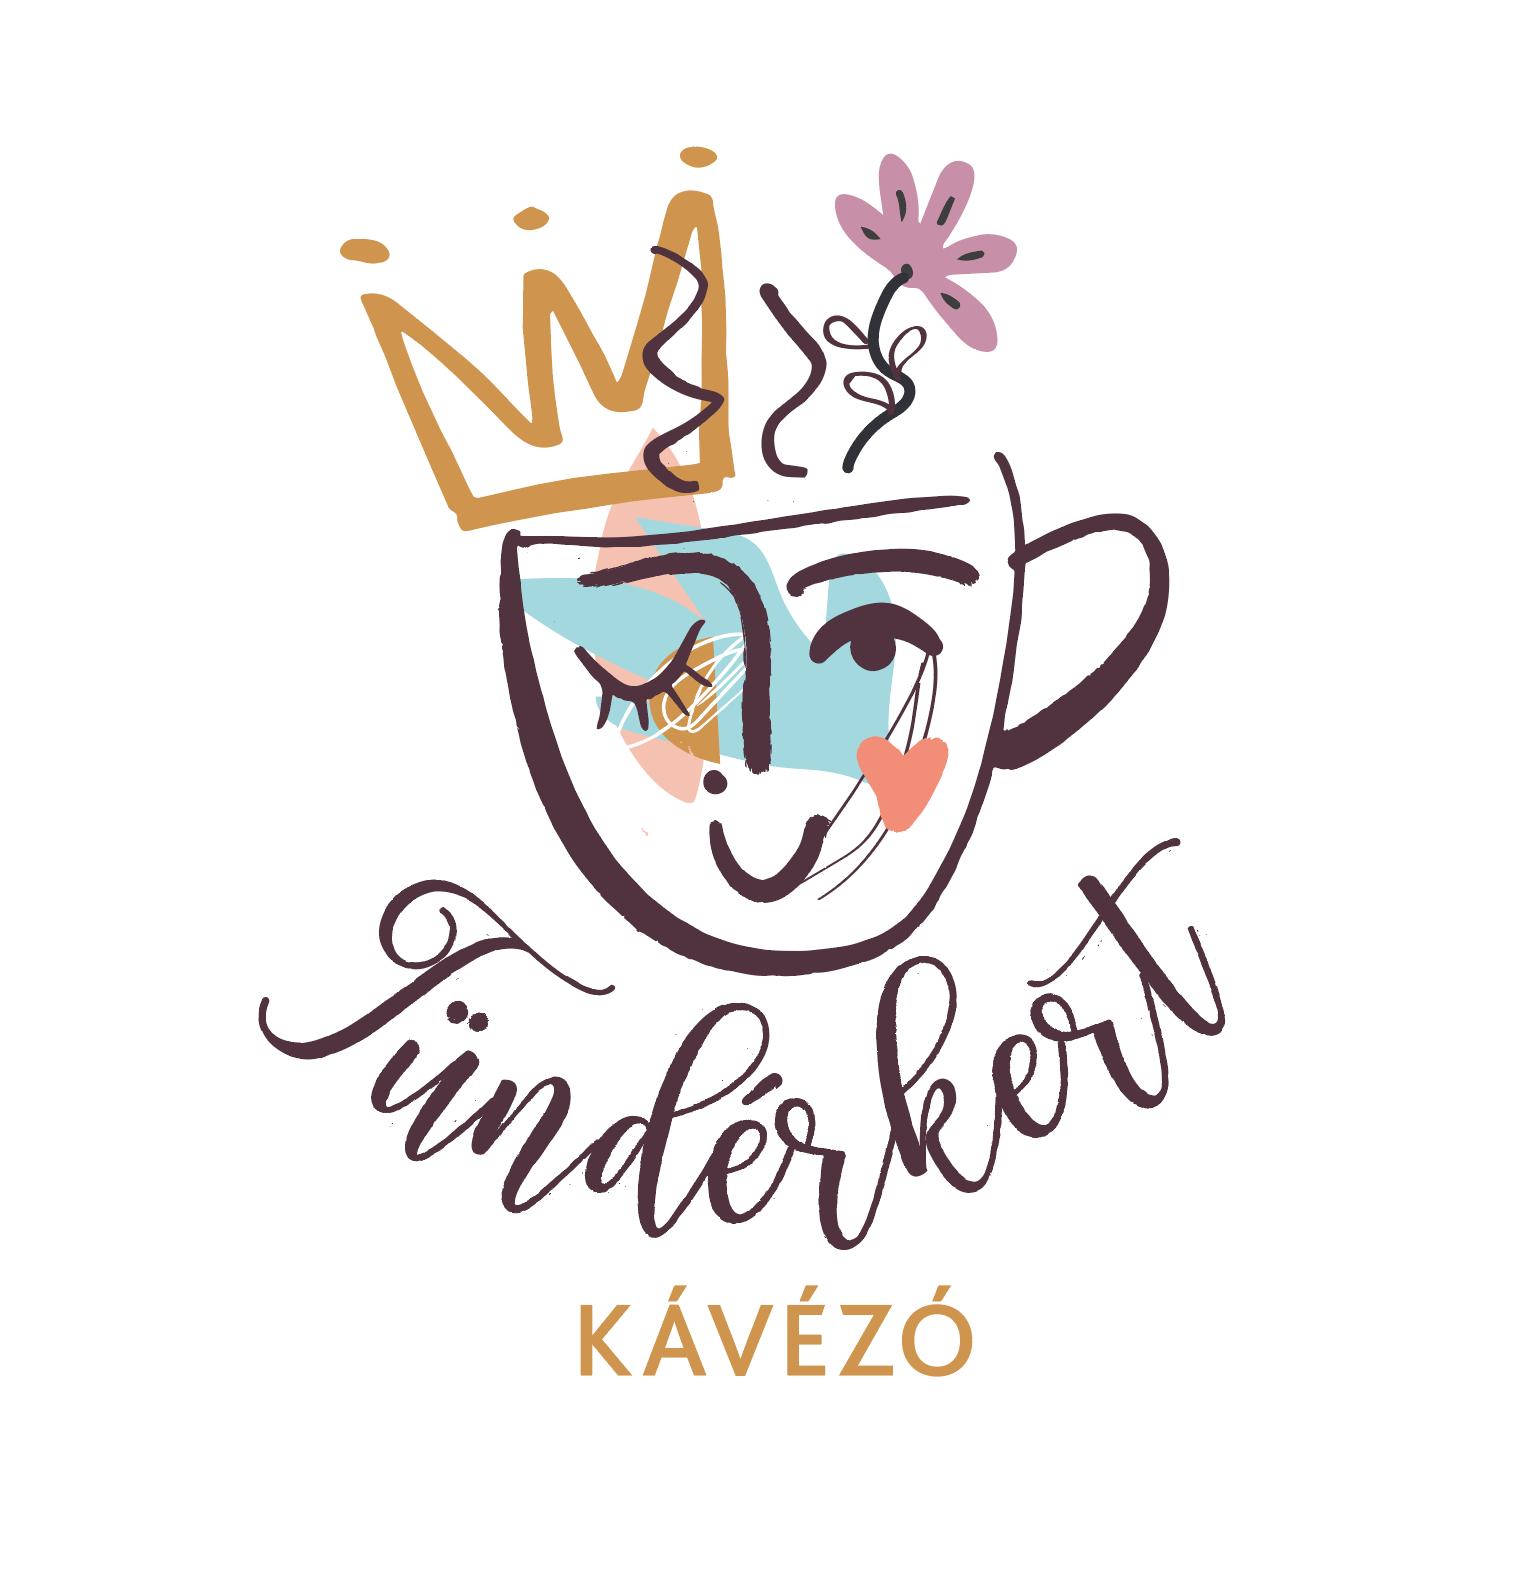 logo_tunderkave